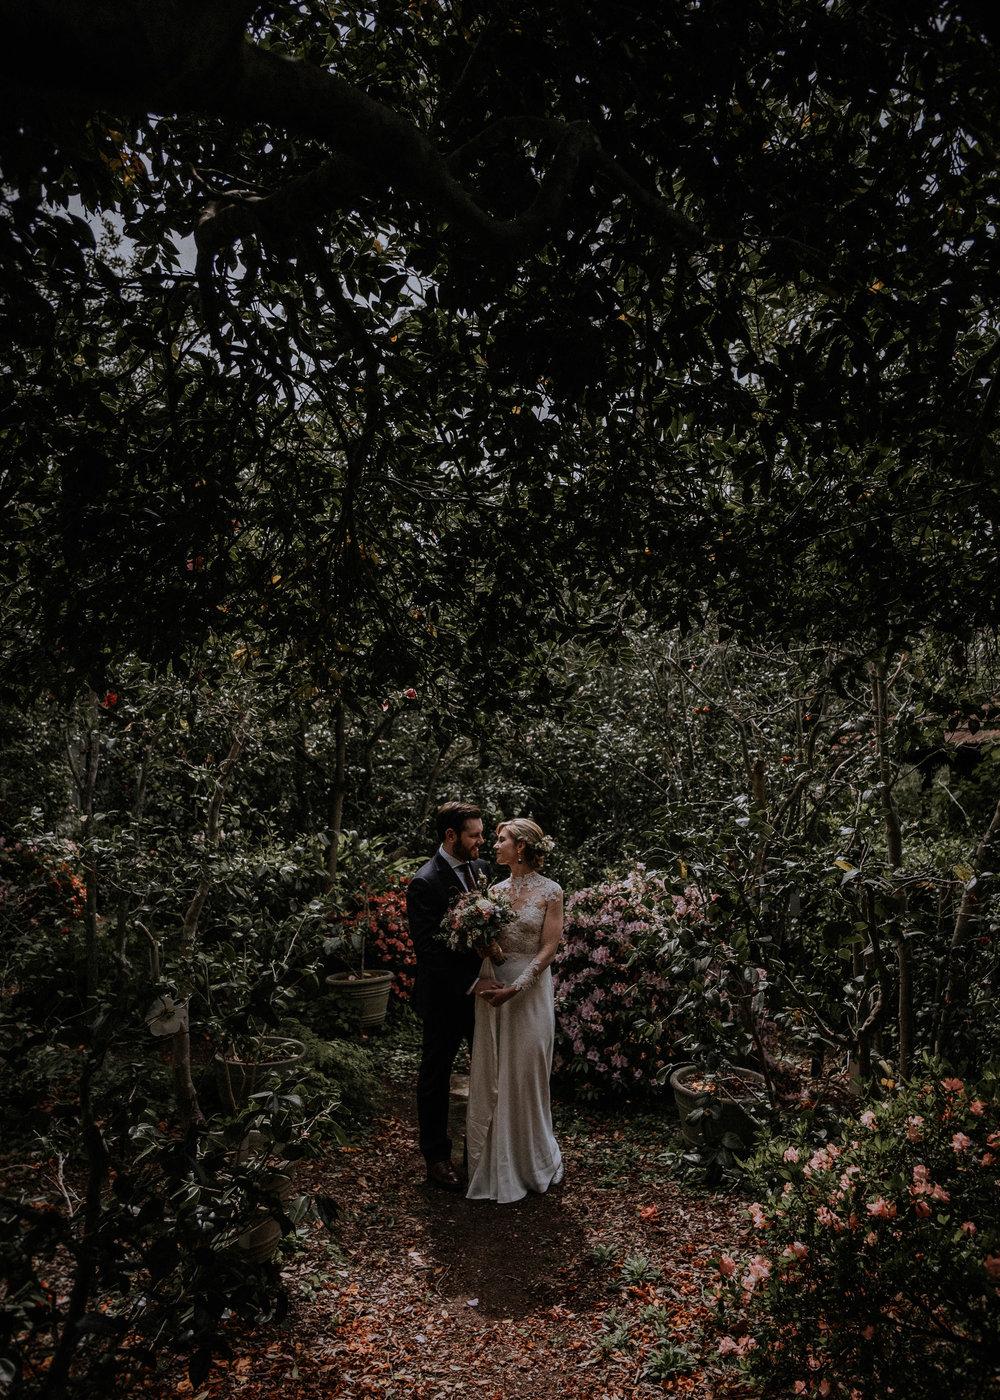 R+M_elopement wedding photography_kings & thieves_blog (82 of 326).jpg